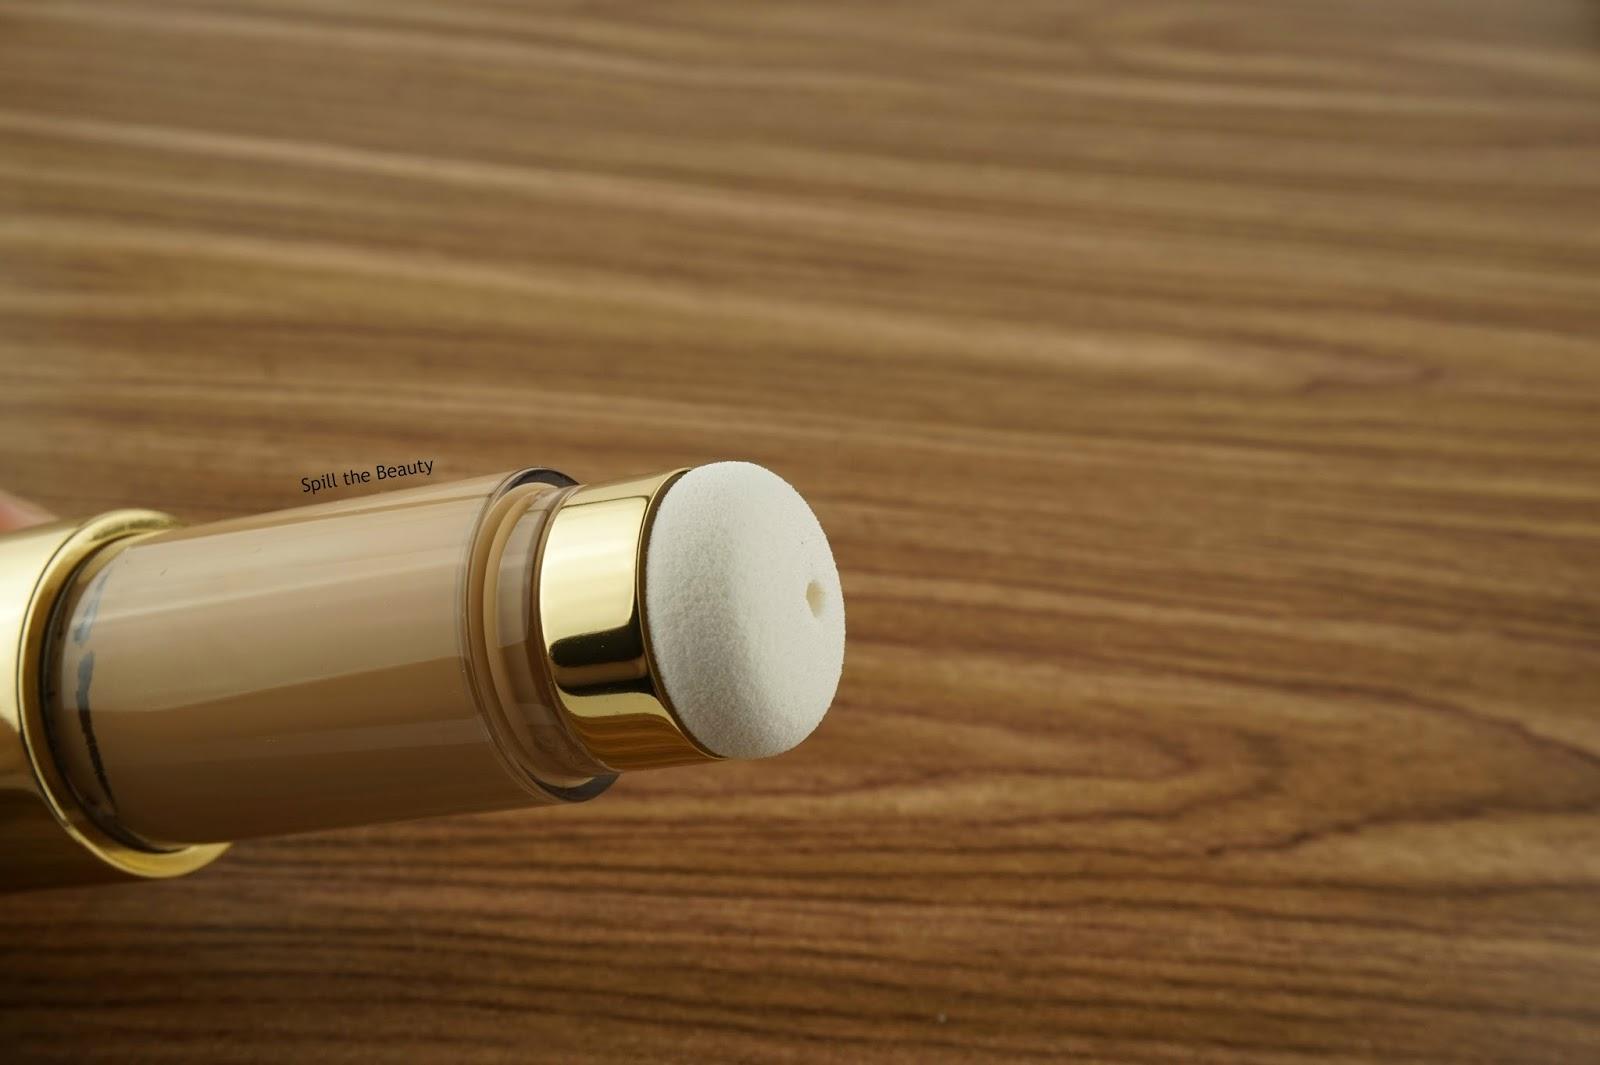 estee lauder double wear nude cushion stick radiant makeup 2w1 dawn review